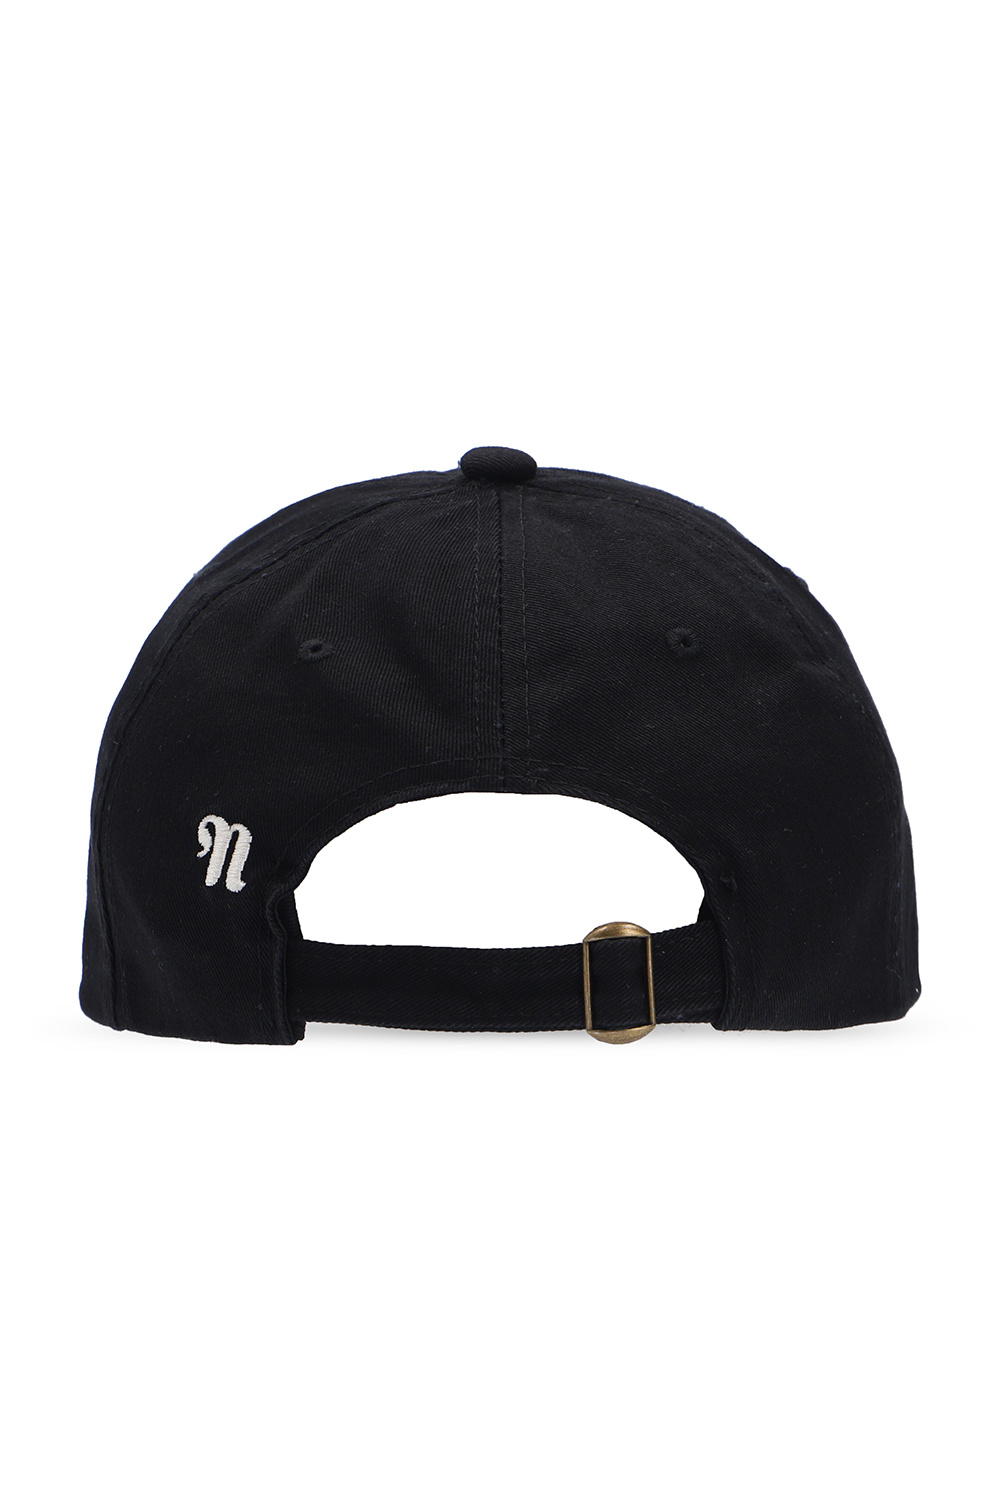 Nanushka Baseball cap with logo